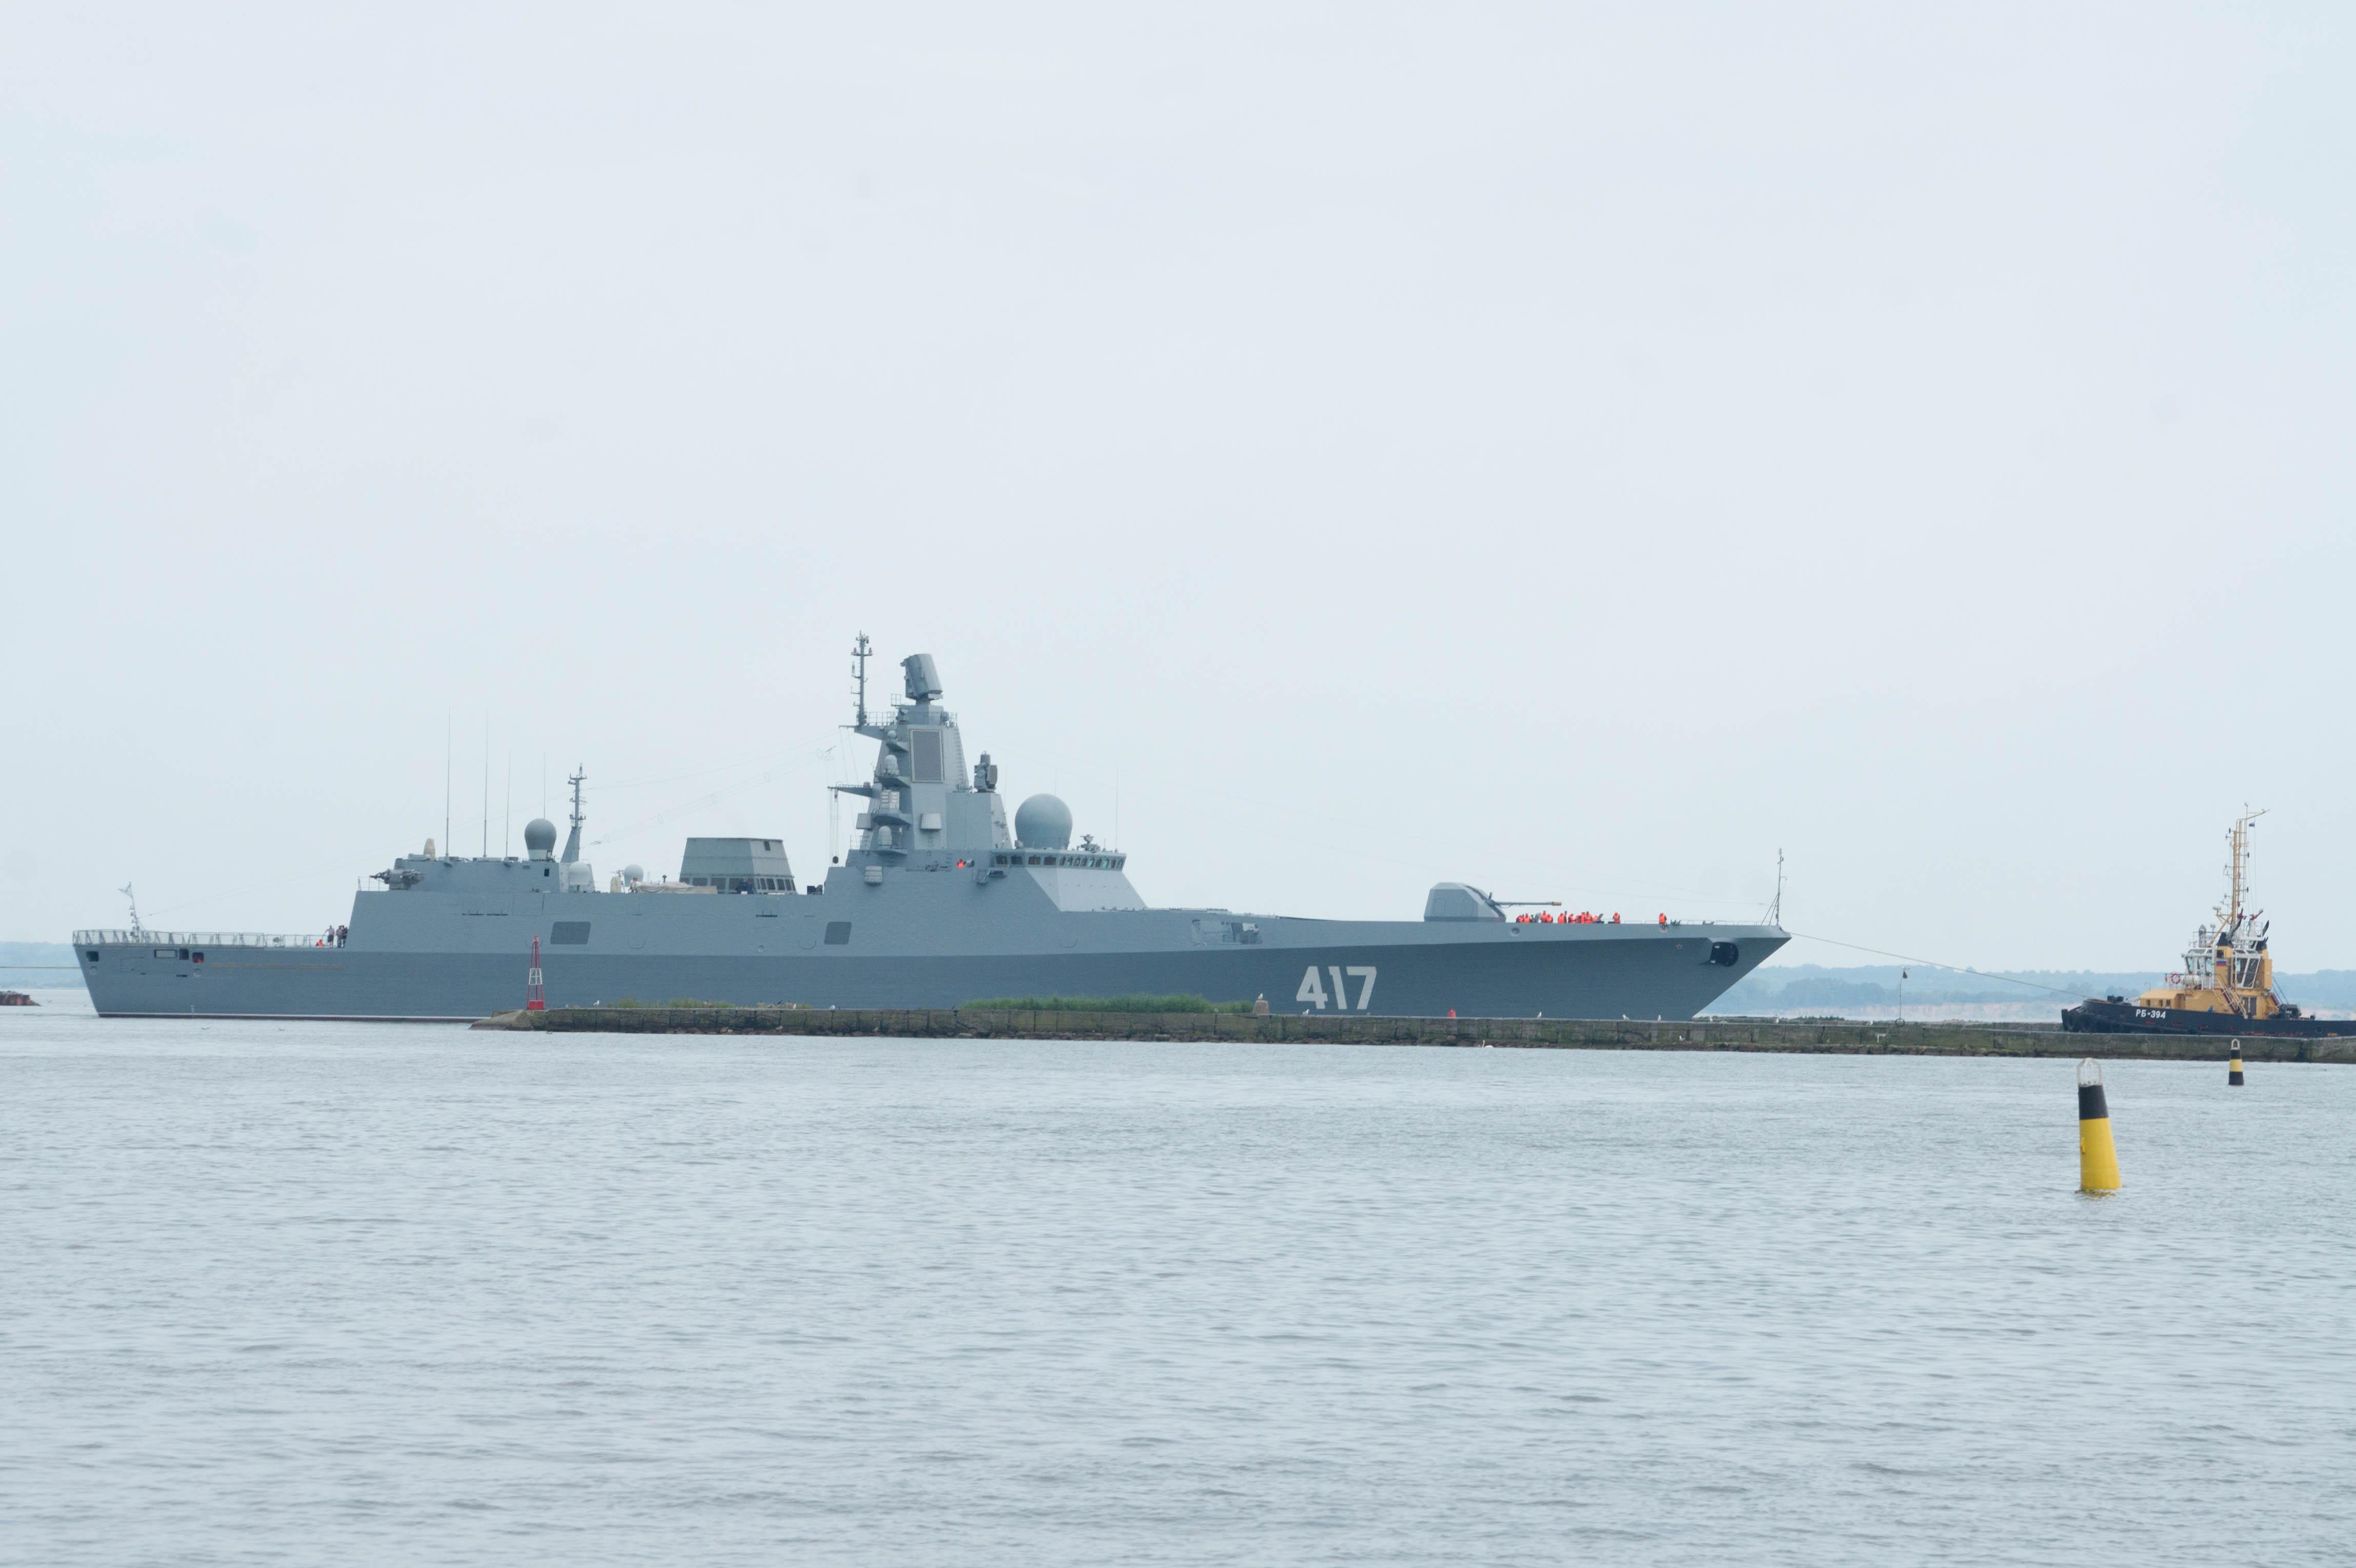 A Gorshkov-class frigate under tow.